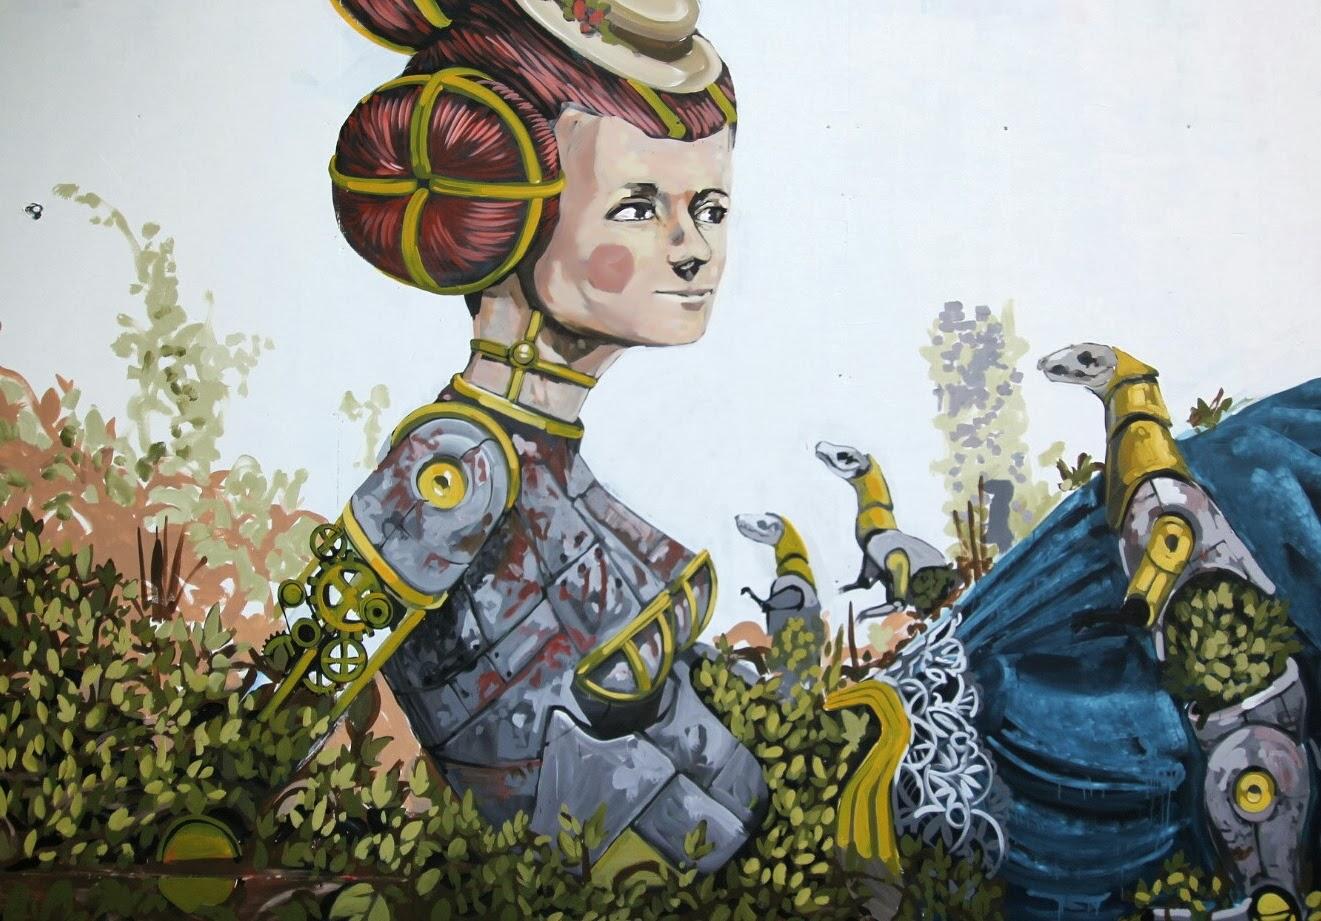 pixel-pancho-new-mural-in-shoreditch-london-03